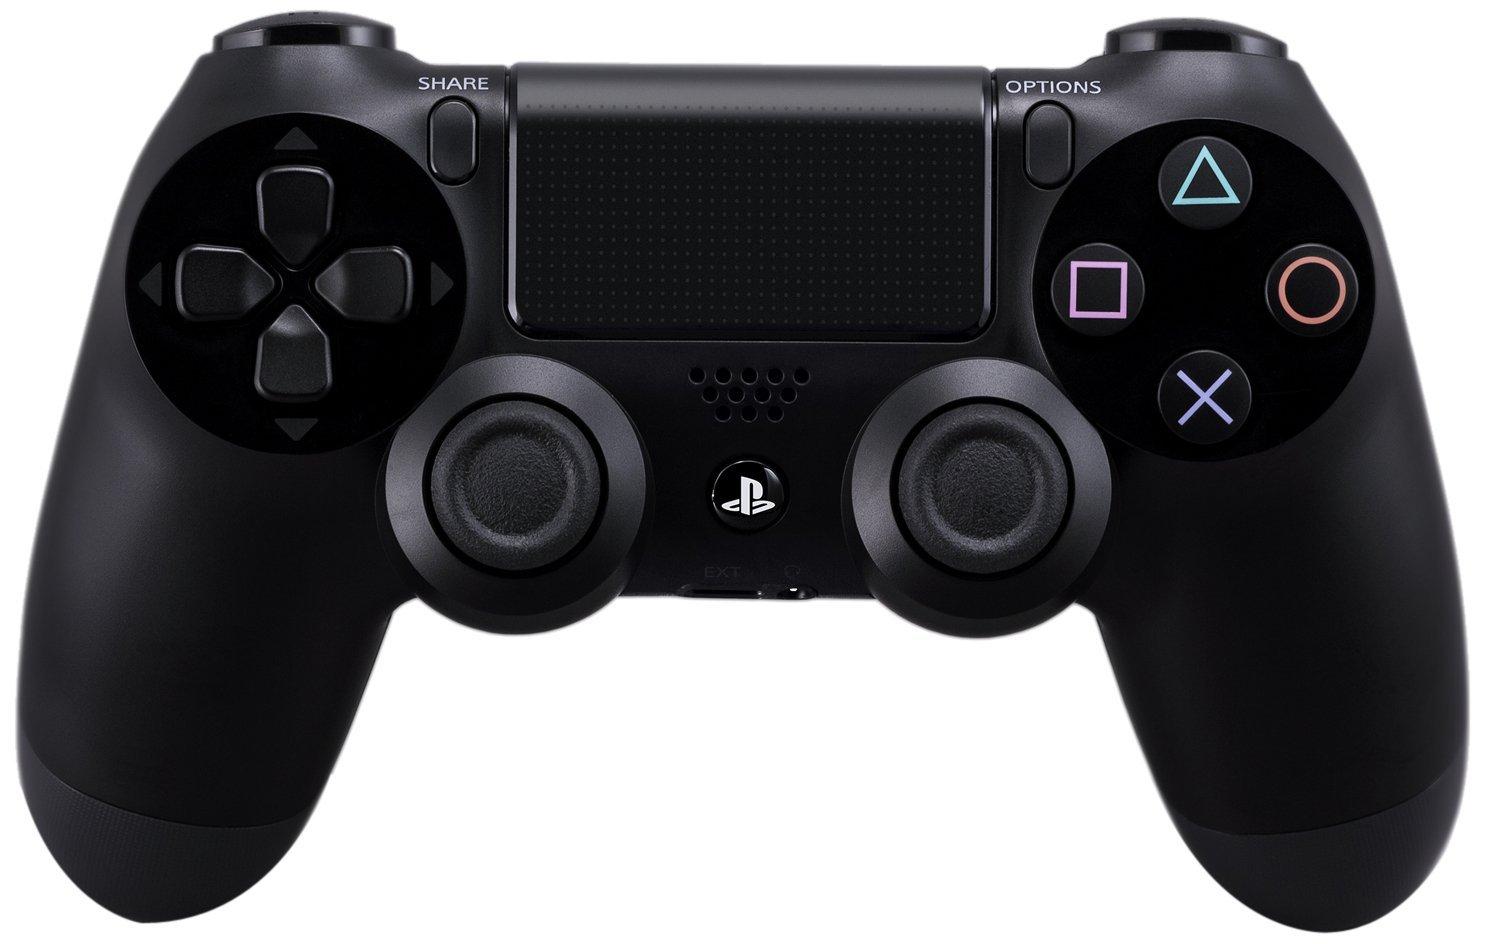 Геймпад беспроводной Sony Dualshock 4 [PS4] (Black)